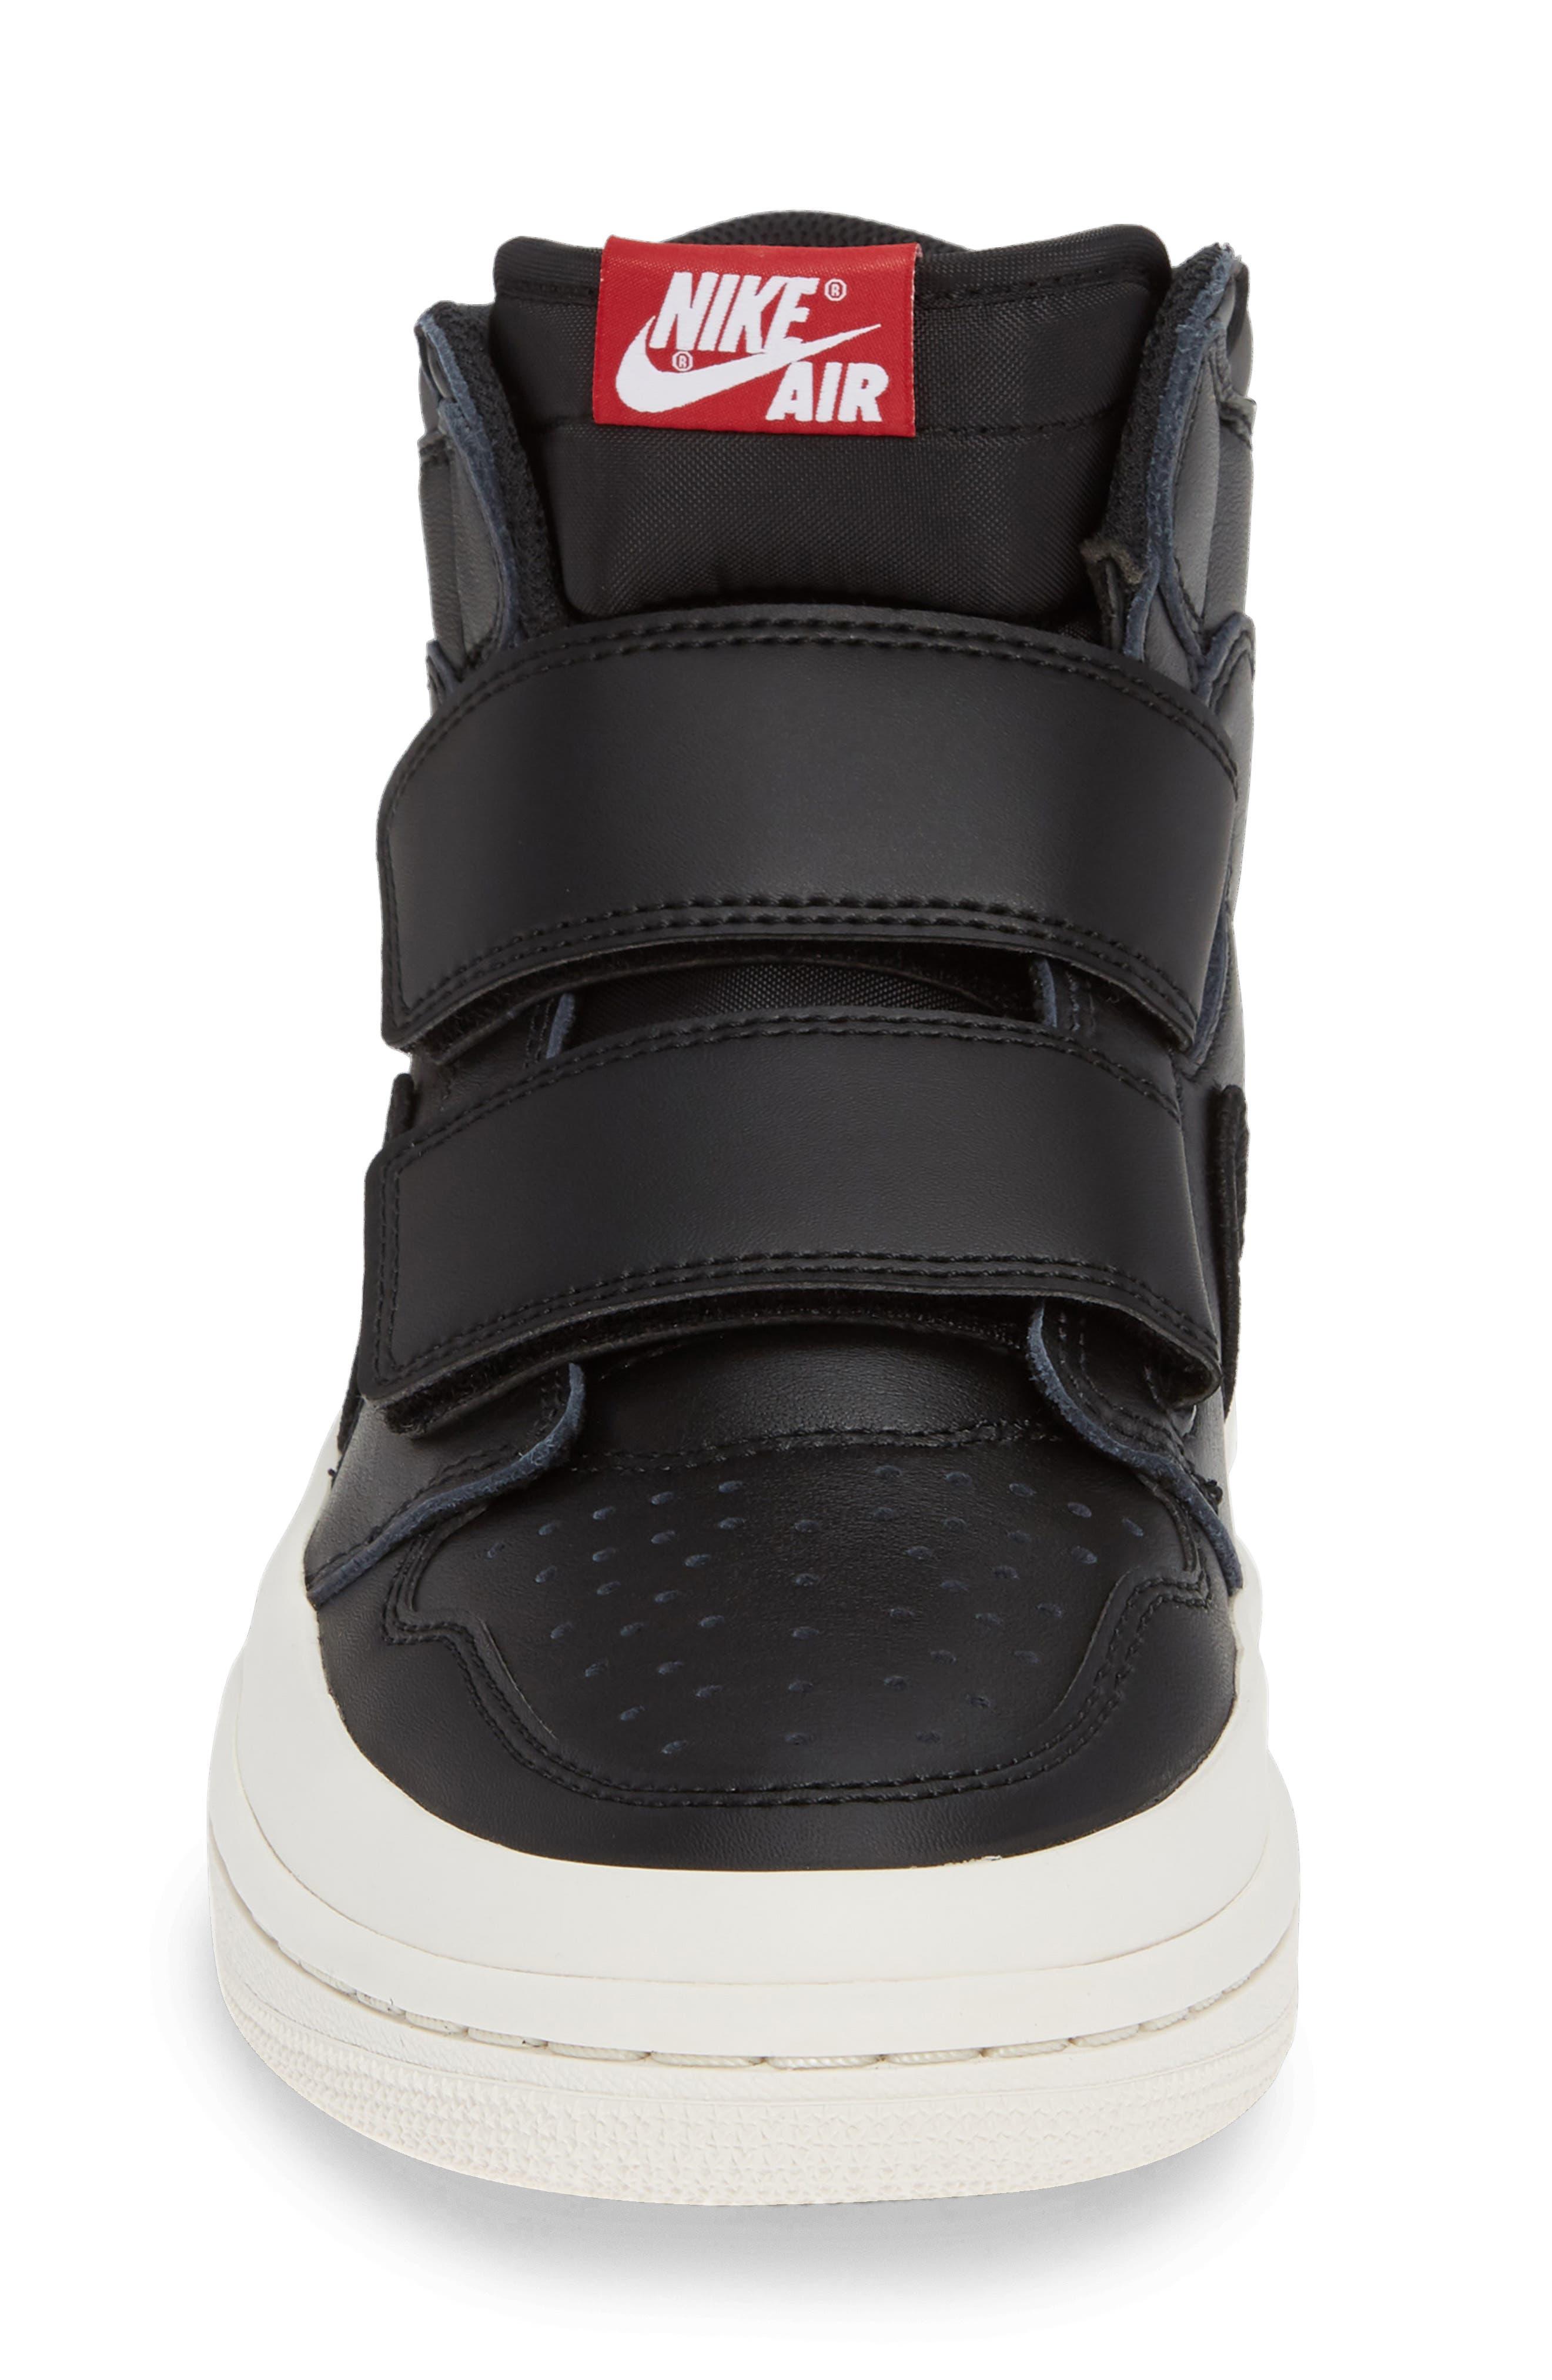 Air Jordan 1 Retro High Double Strap Sneaker,                             Alternate thumbnail 4, color,                             BLACK/ GYM RED